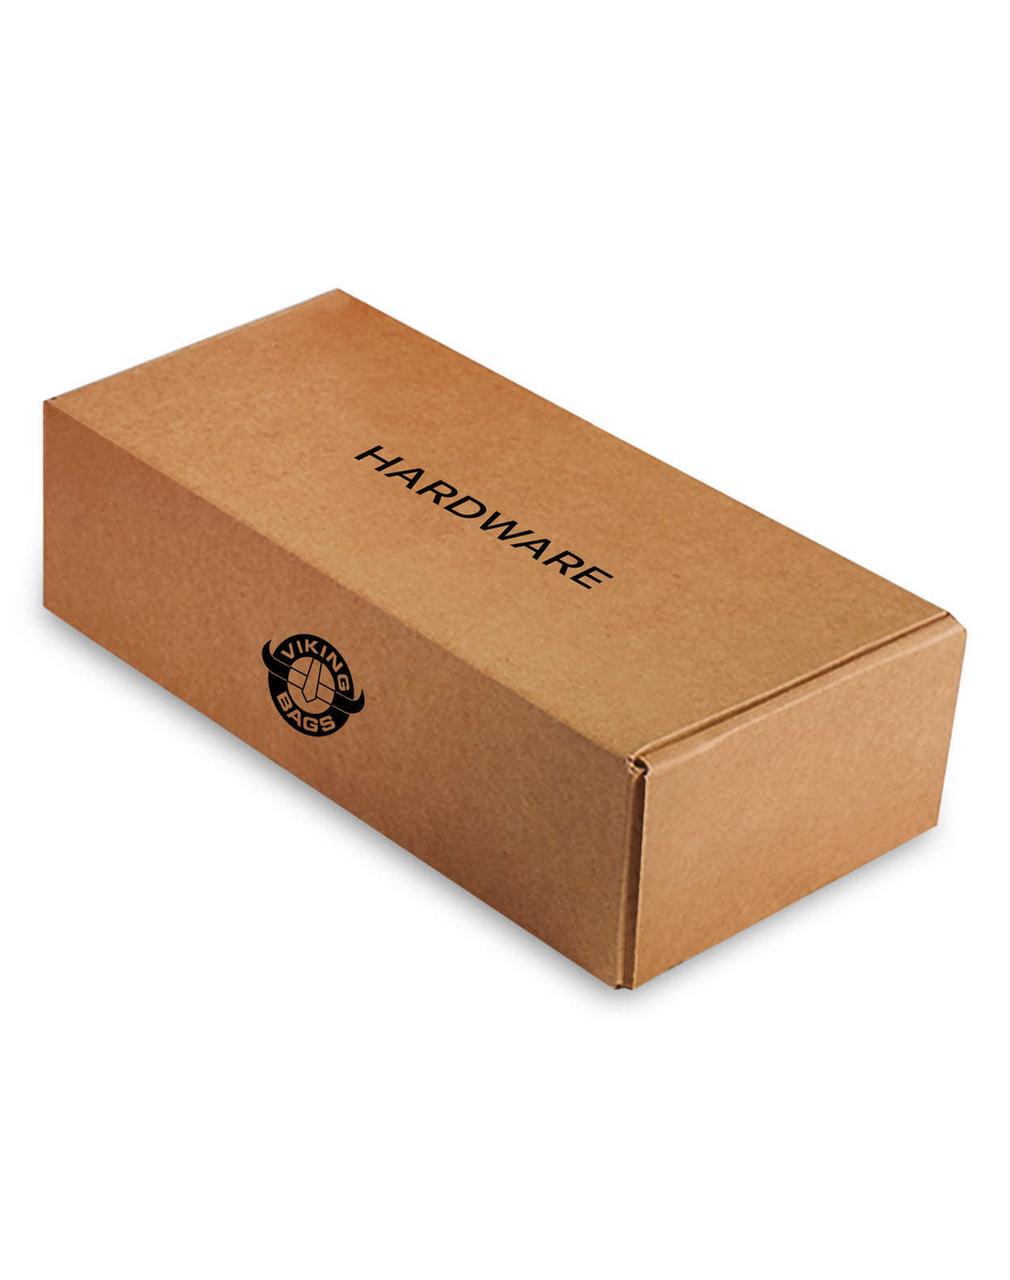 Honda VTX 1800 N Medium Charger Single Strap Motorcycle Saddlebags Box